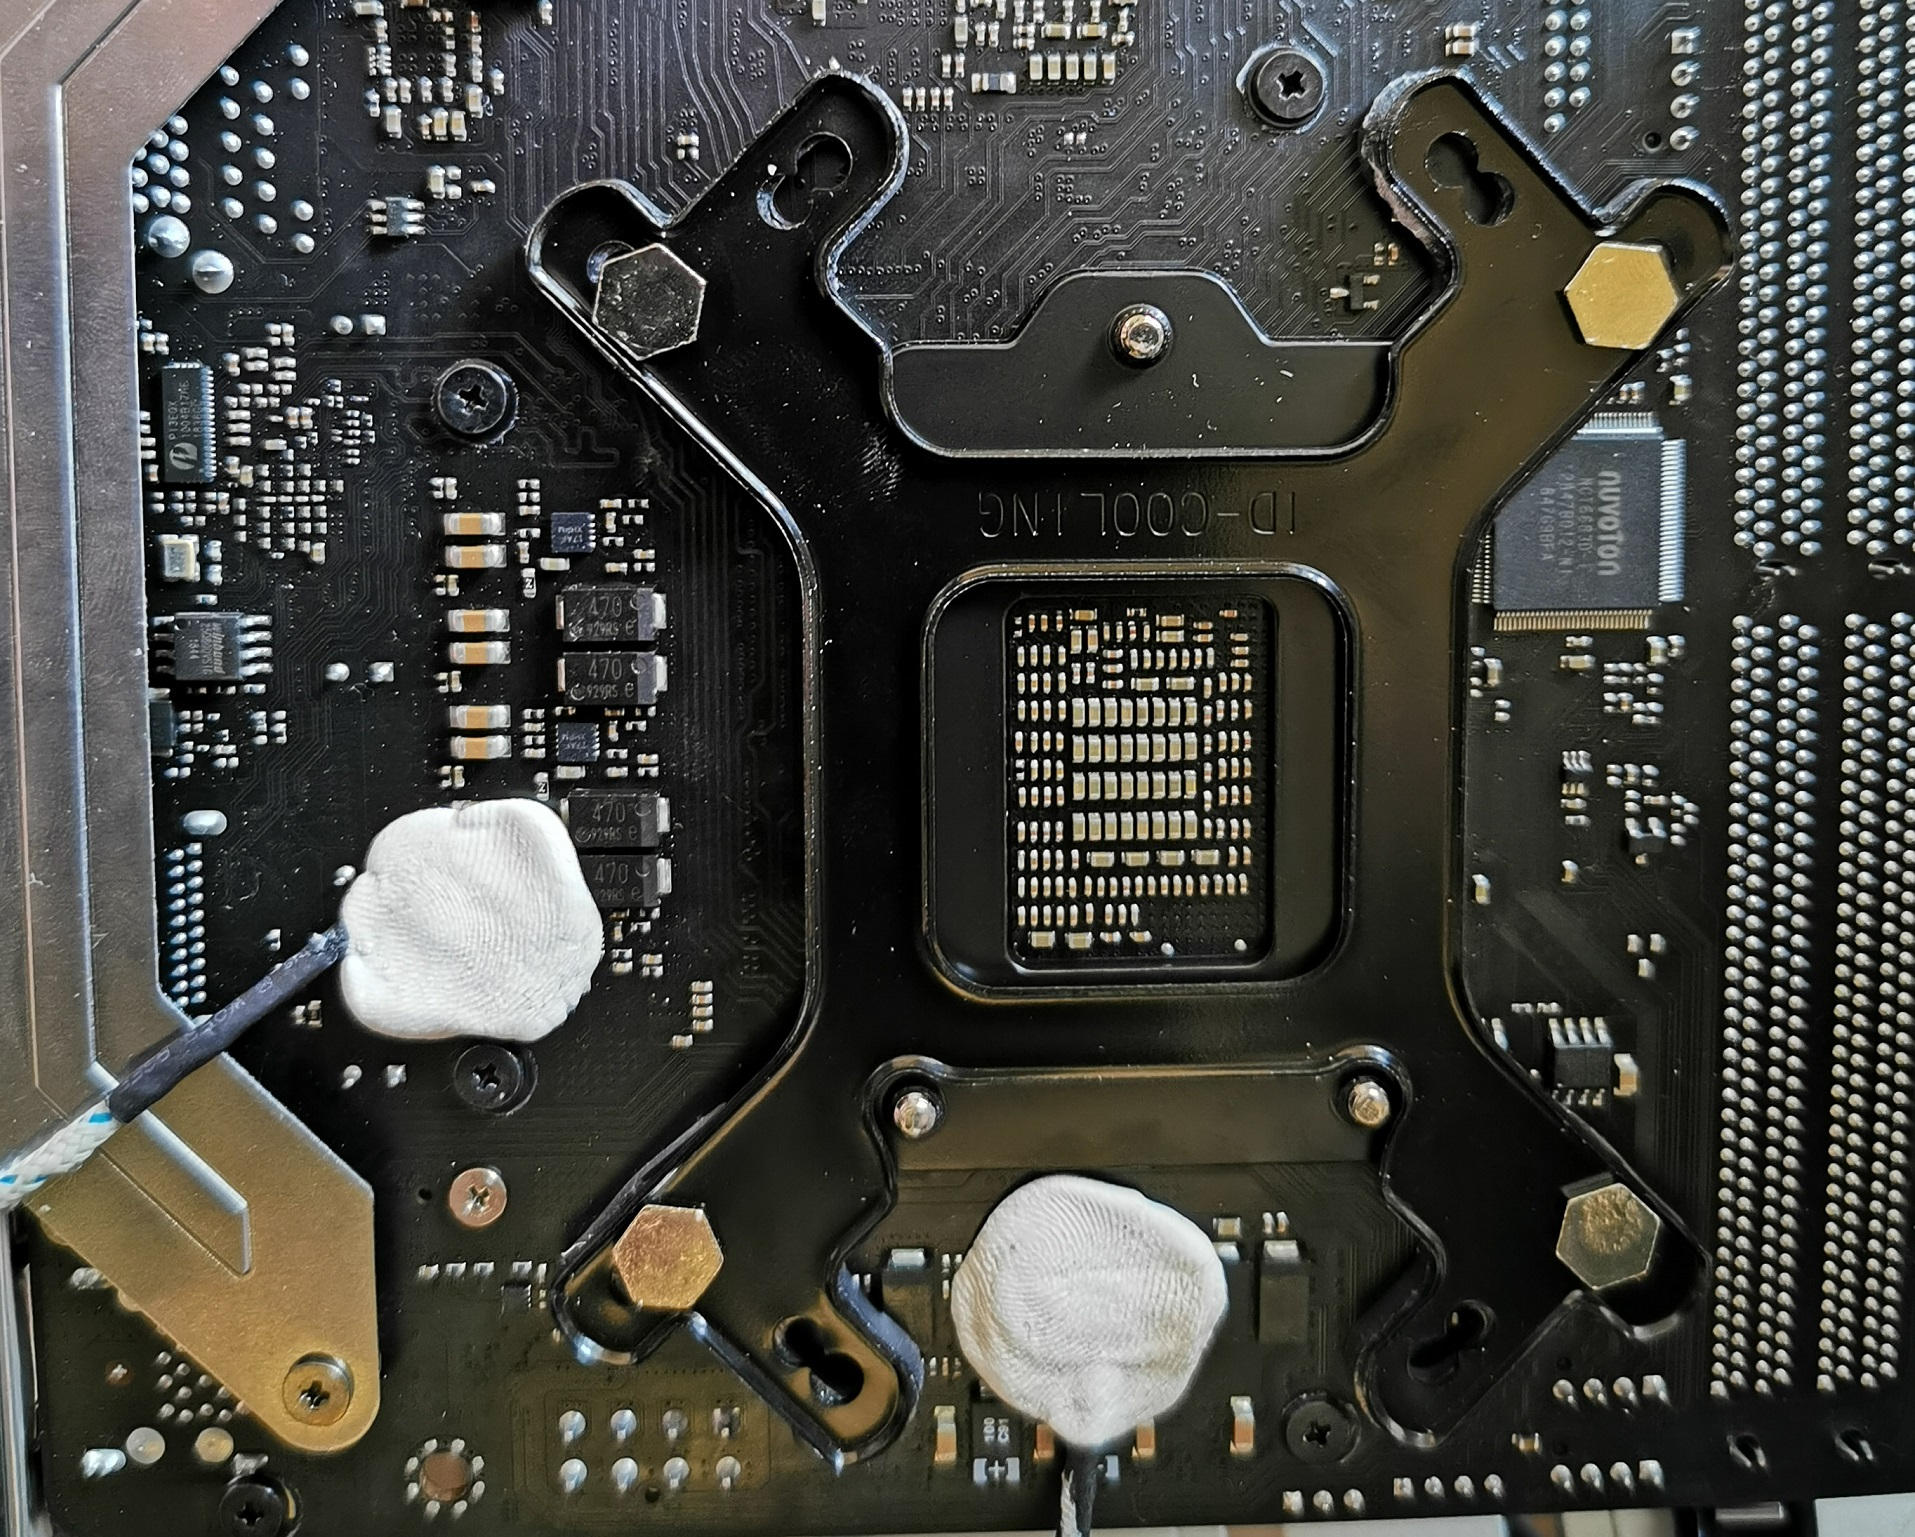 Asrock cpu temp monitor